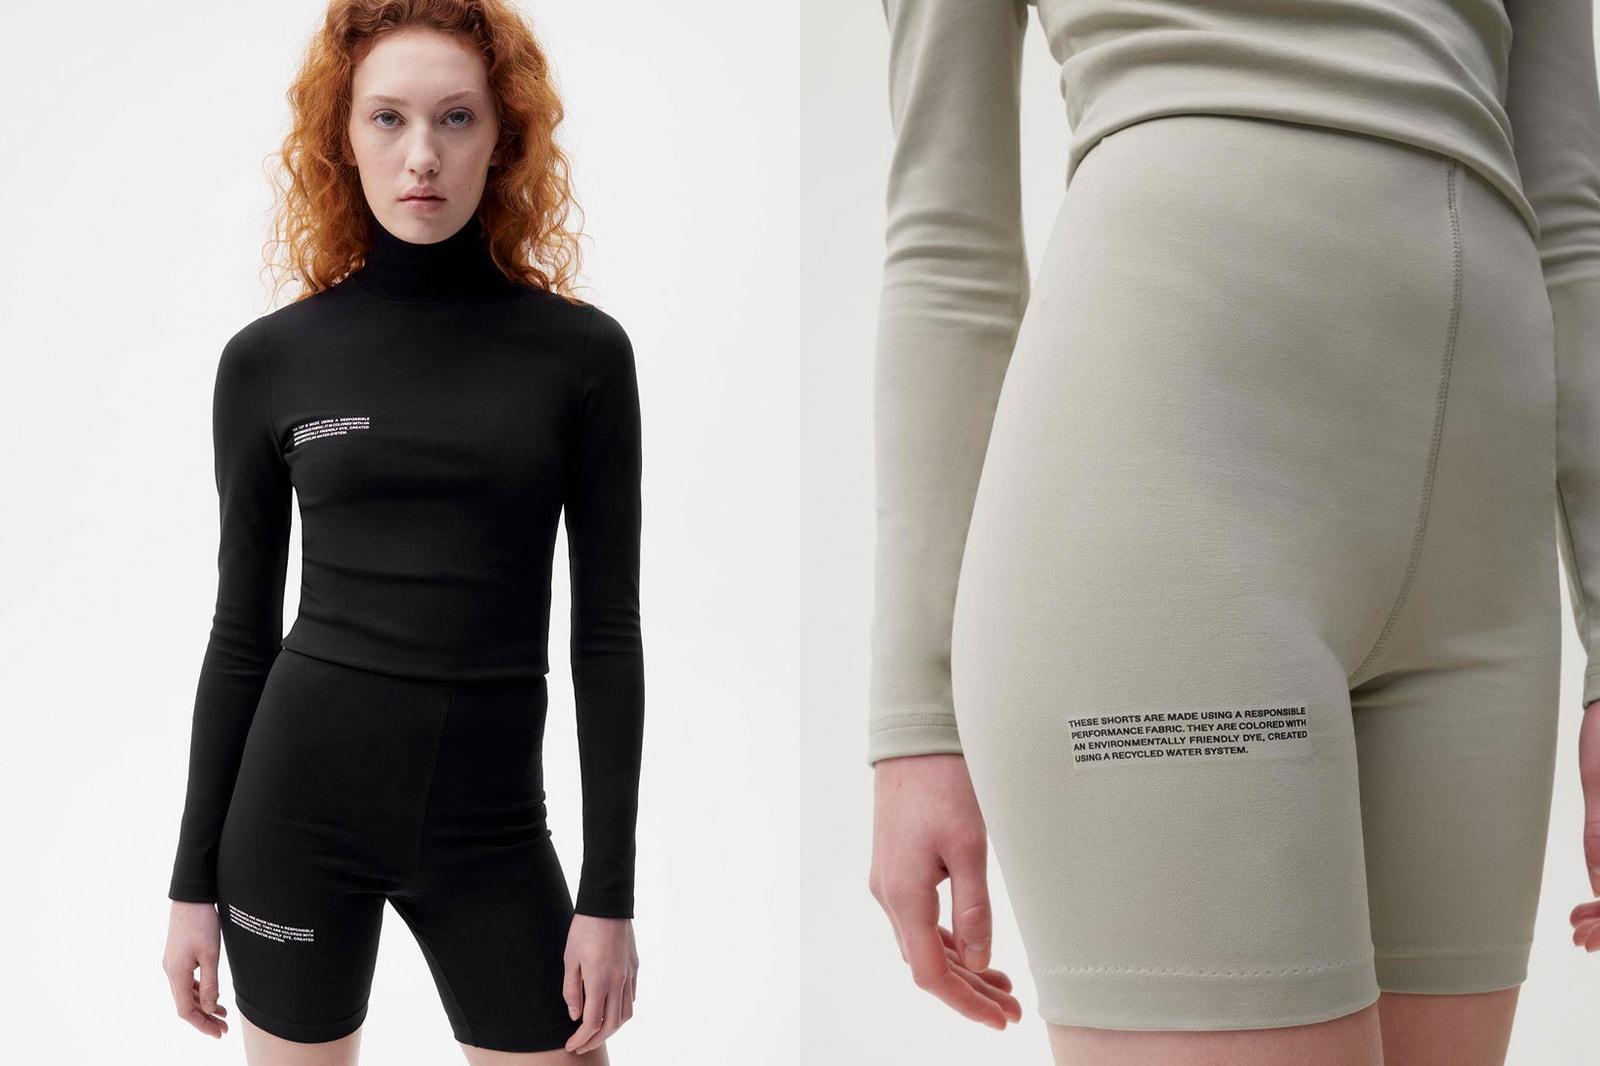 pangaia stretch roica v550 activewear athleisure bike shorts long sleeved tee leggings